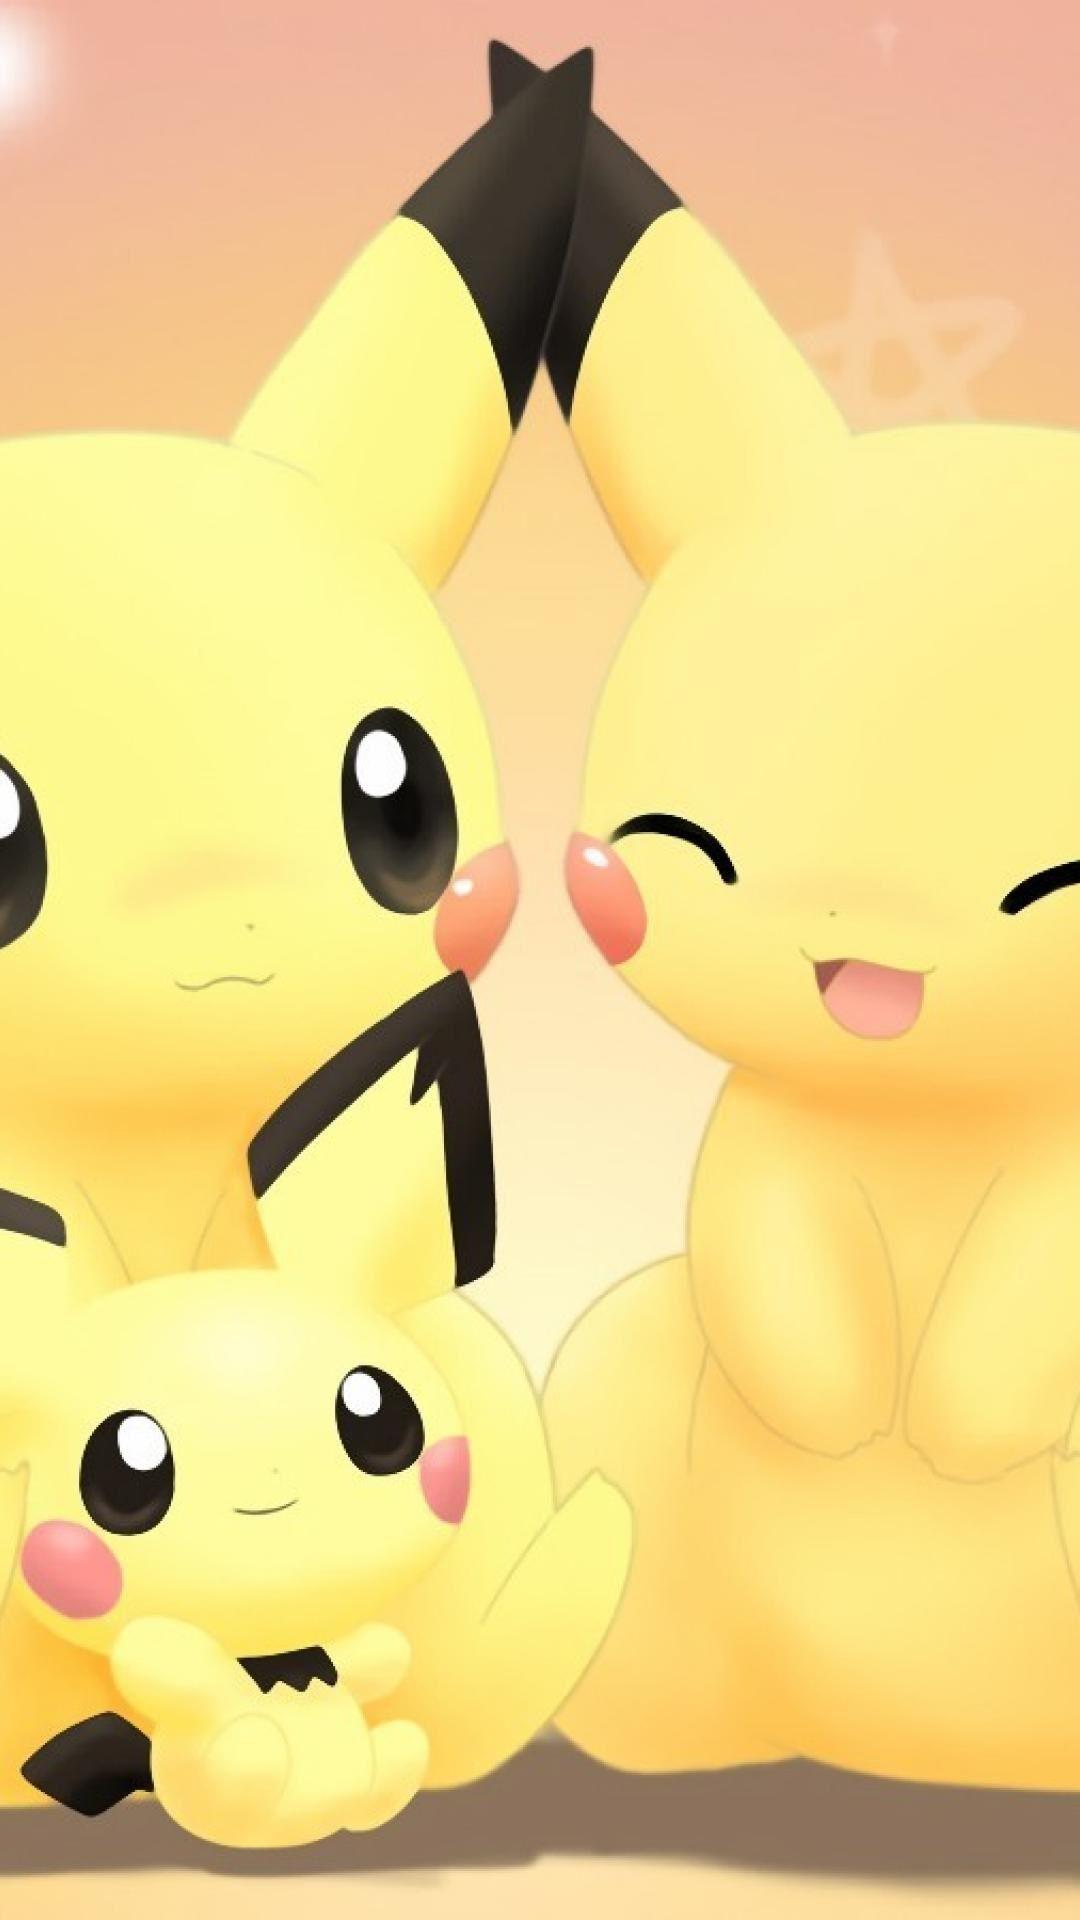 pokemon cute pikachu girly love iphone 6 plus 1080x1920